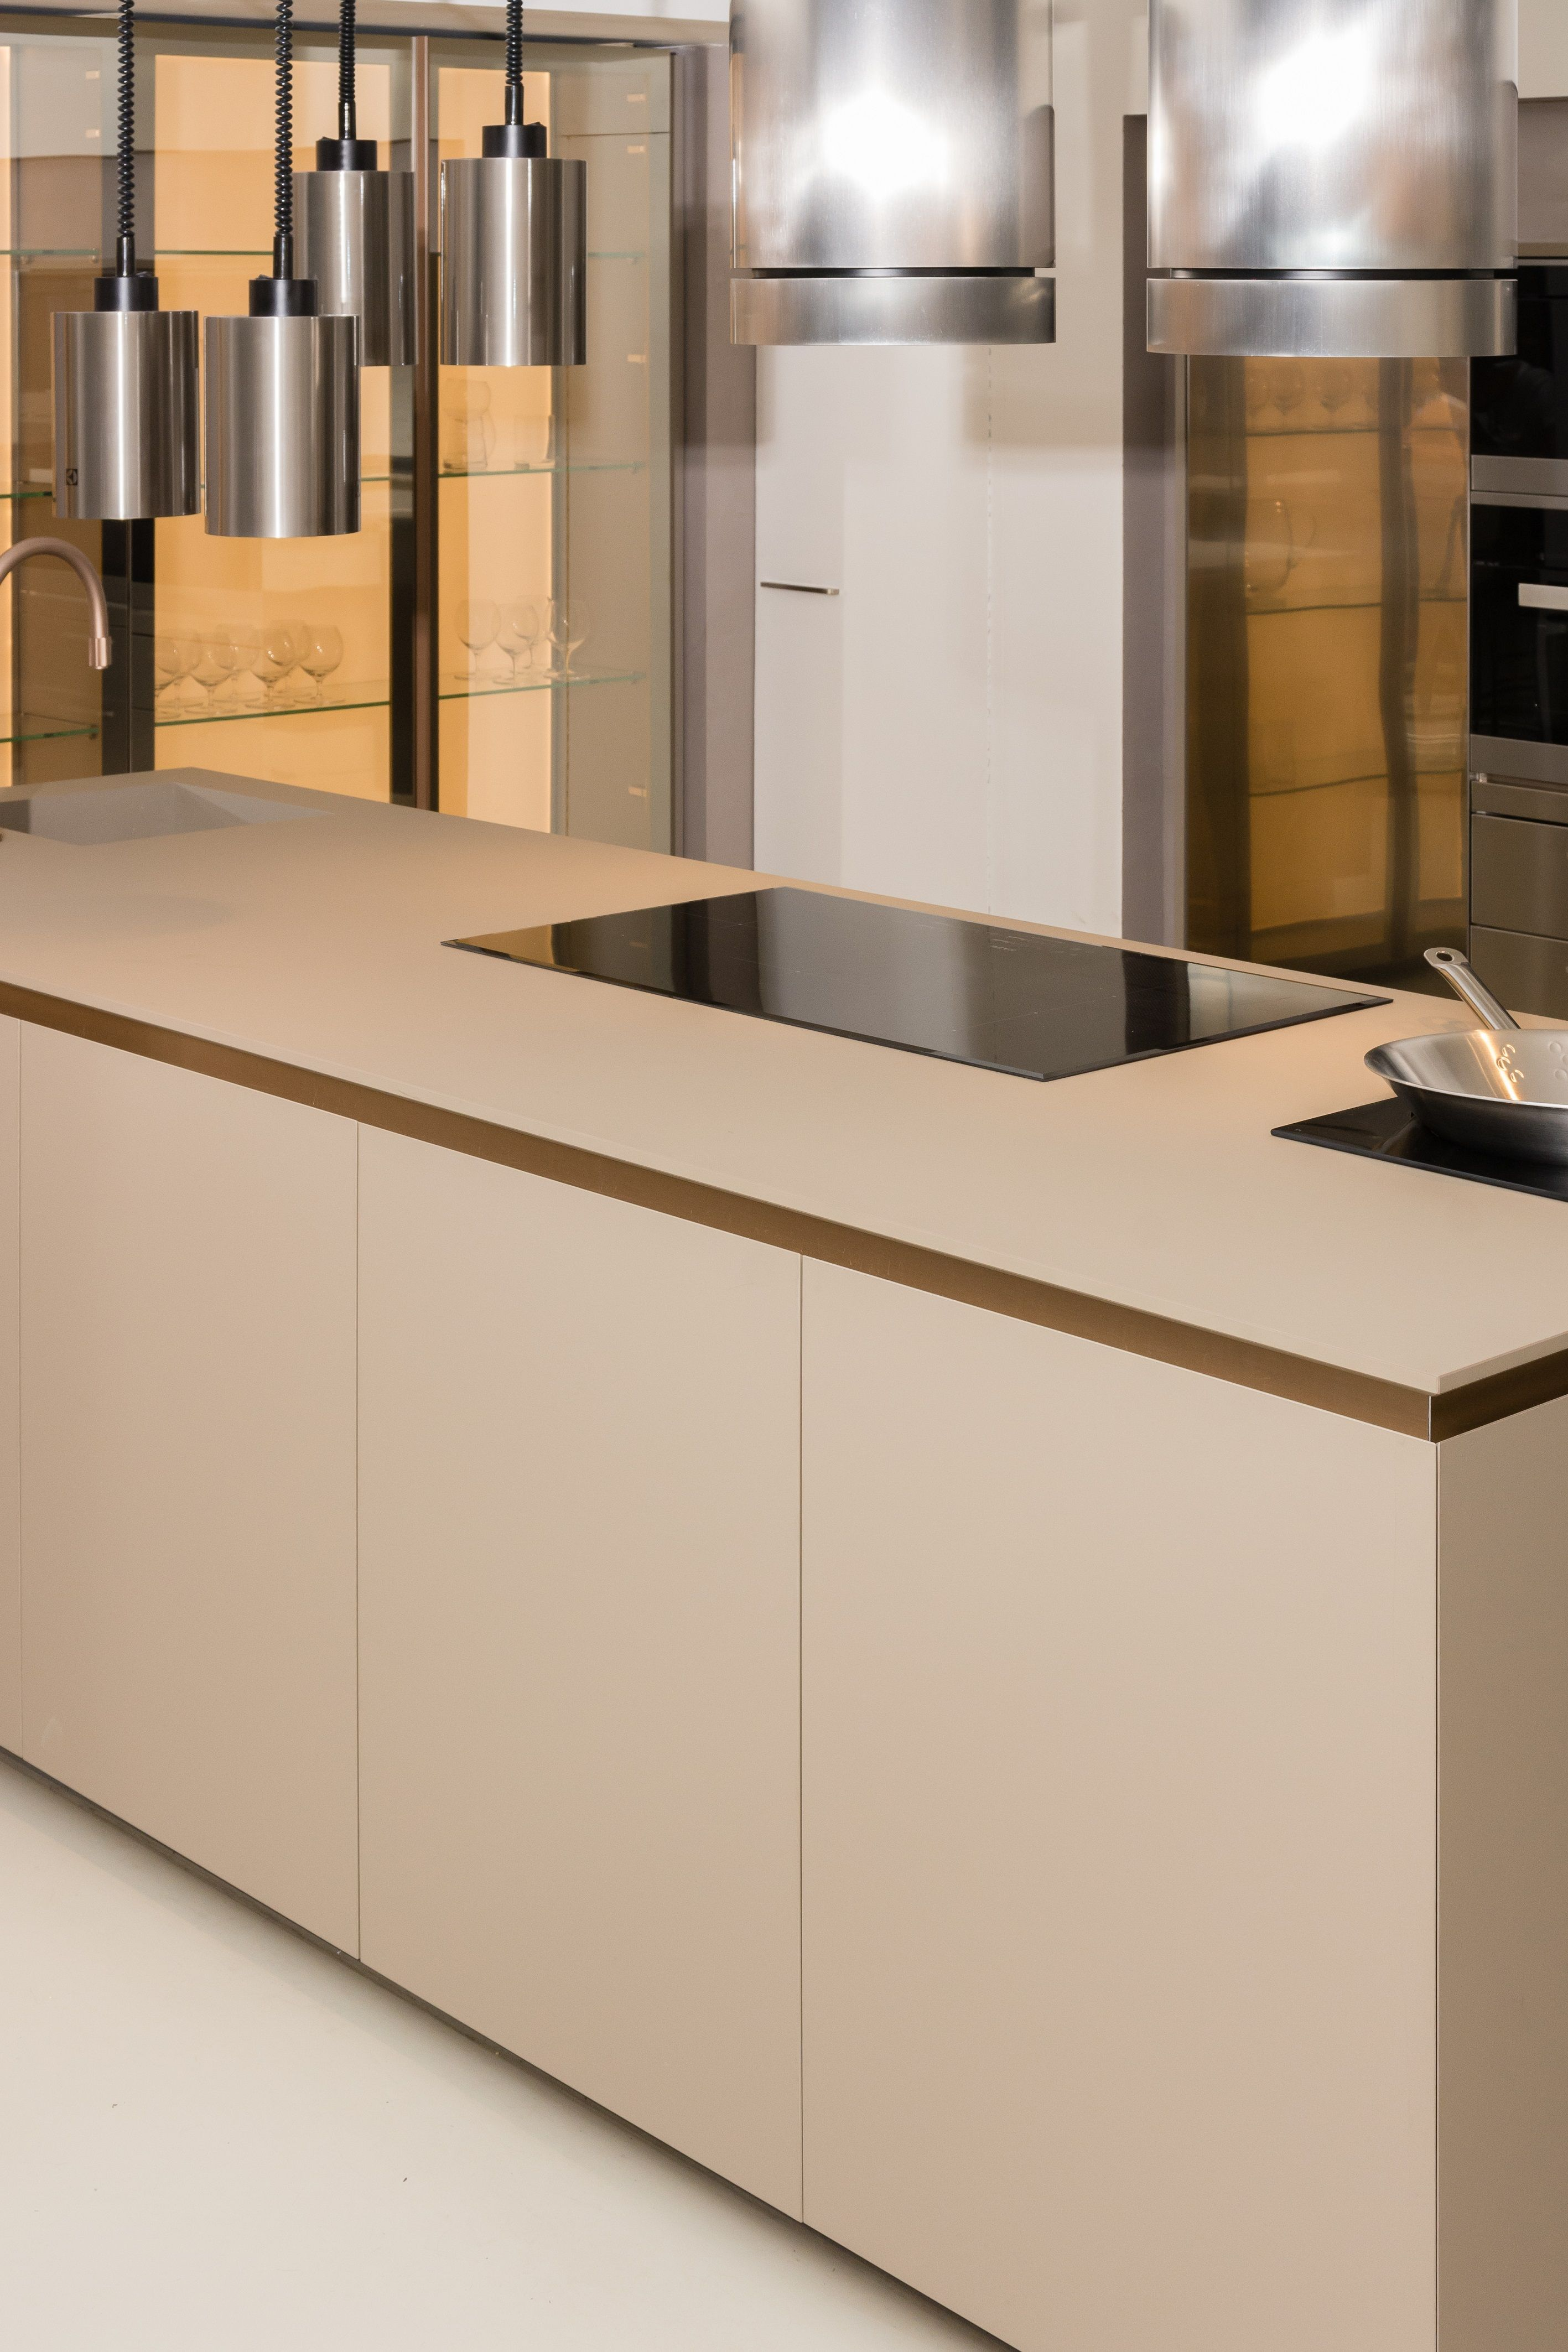 Resin Kitchen Floor Resin Countertop Thermoplastic Fenix Ntm Self Healing Fenix